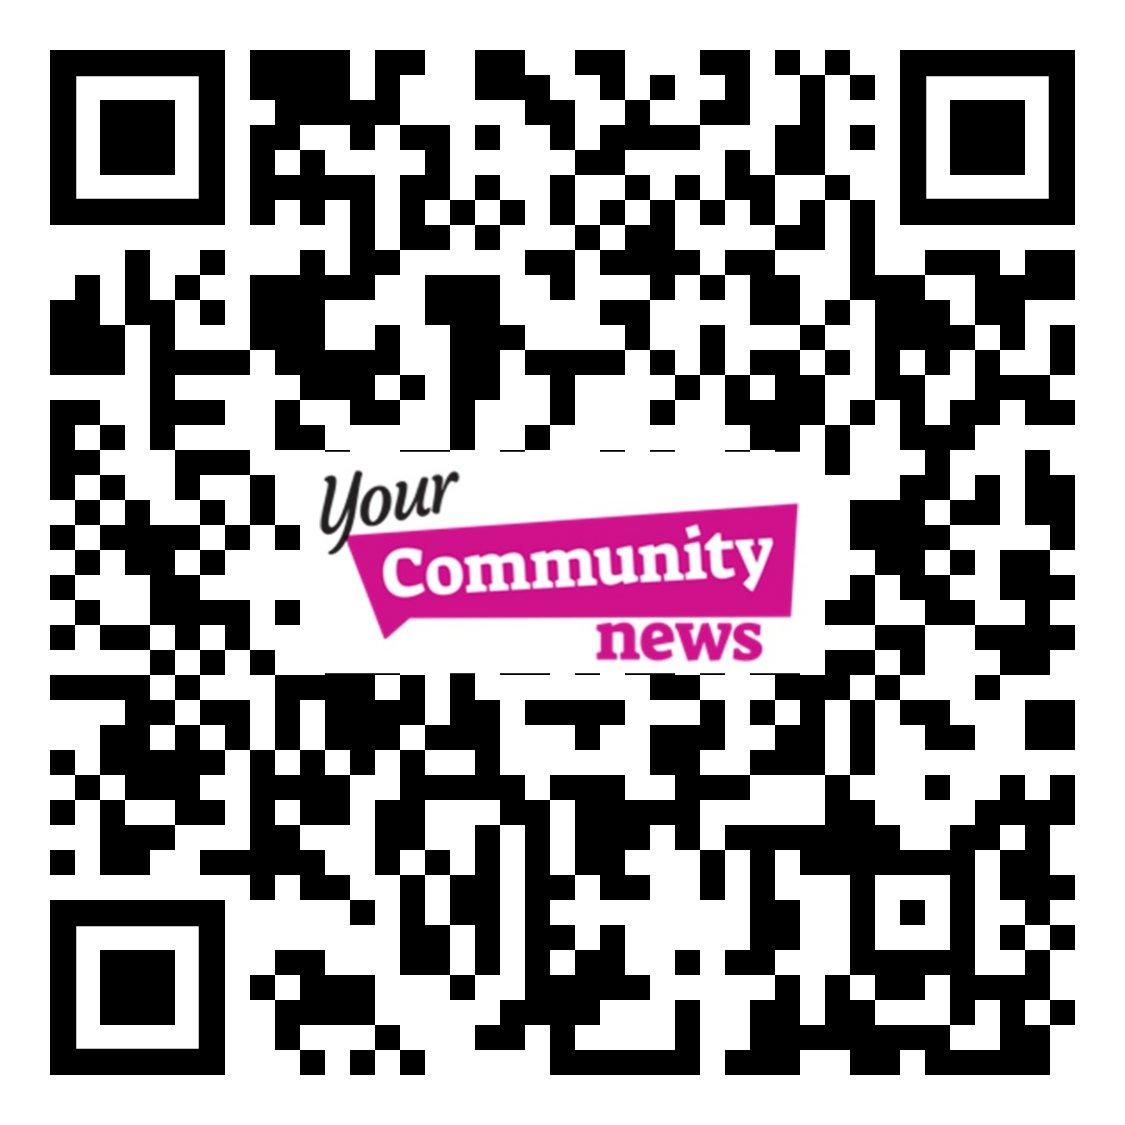 CommunityNews01 photo